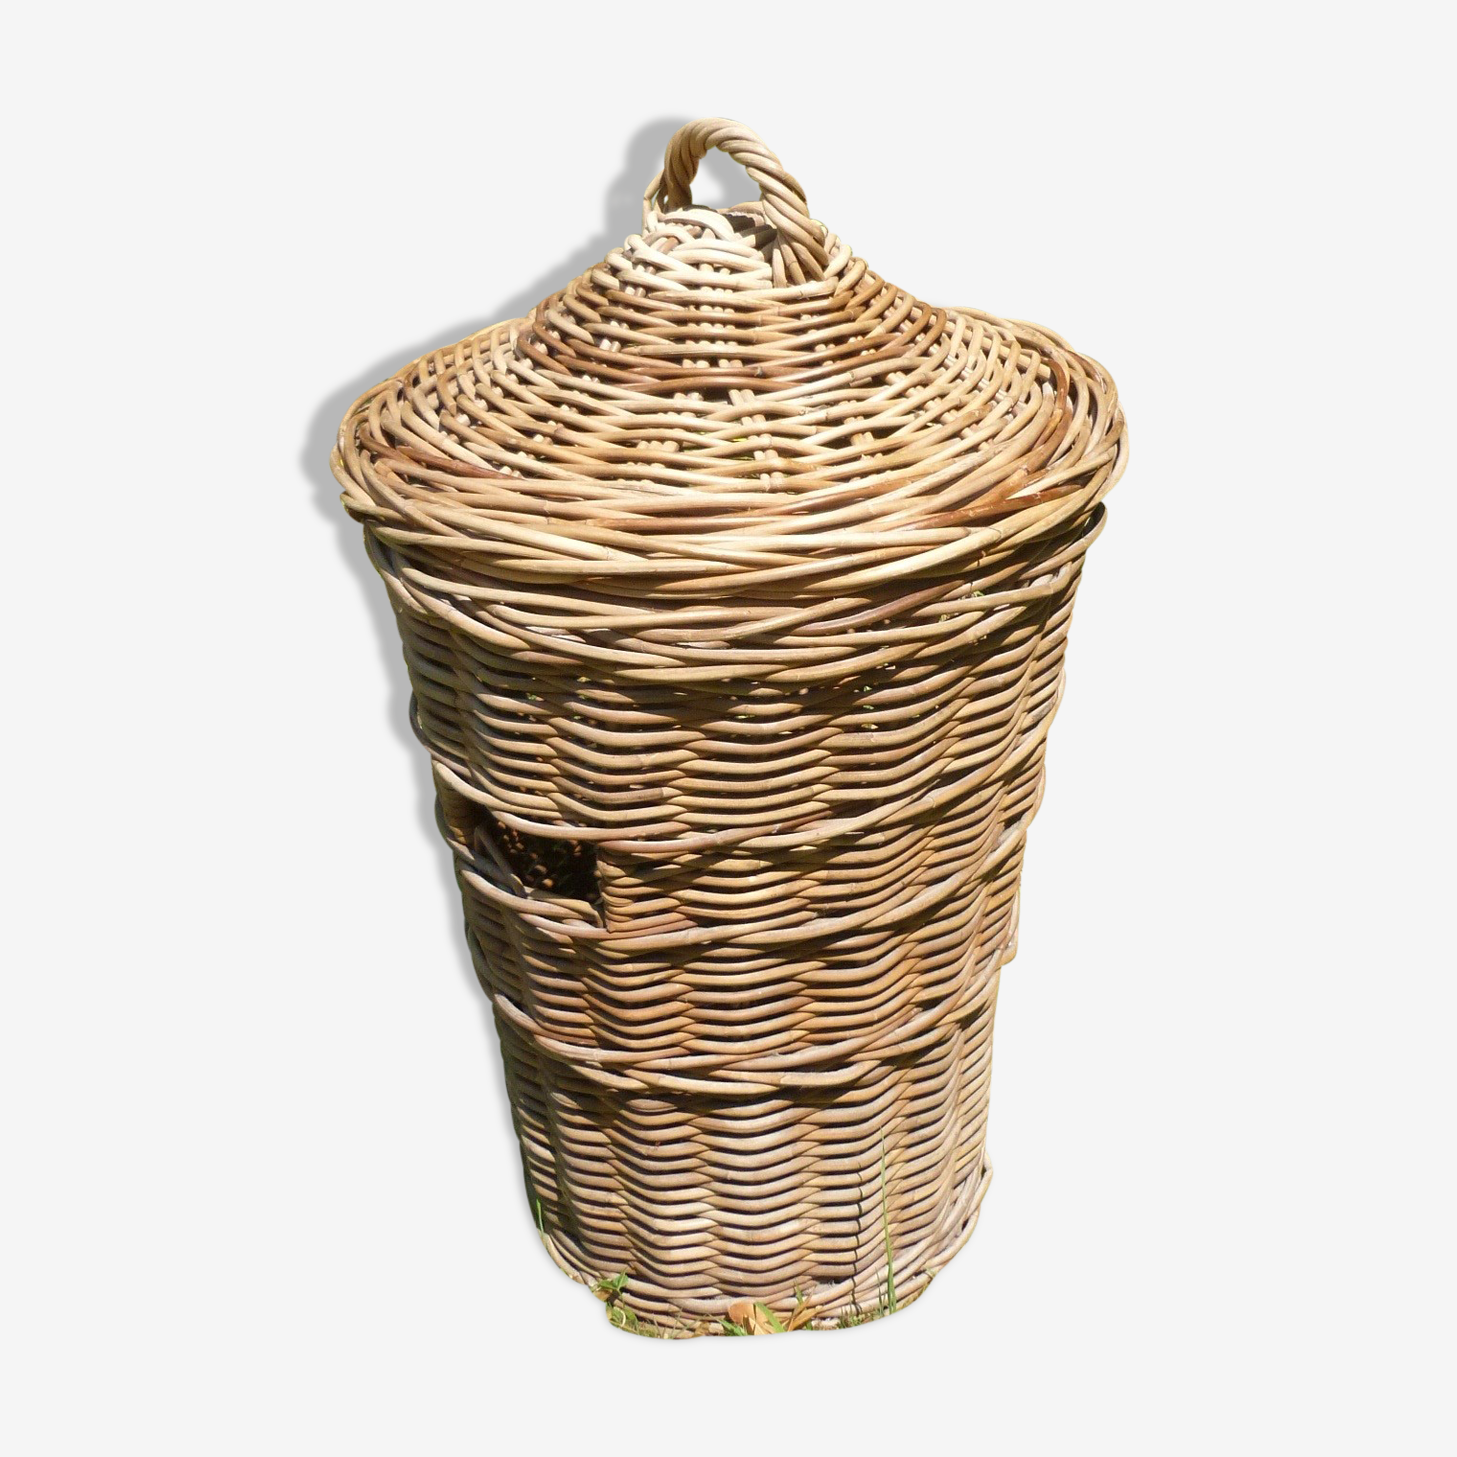 Basket with lid rattan